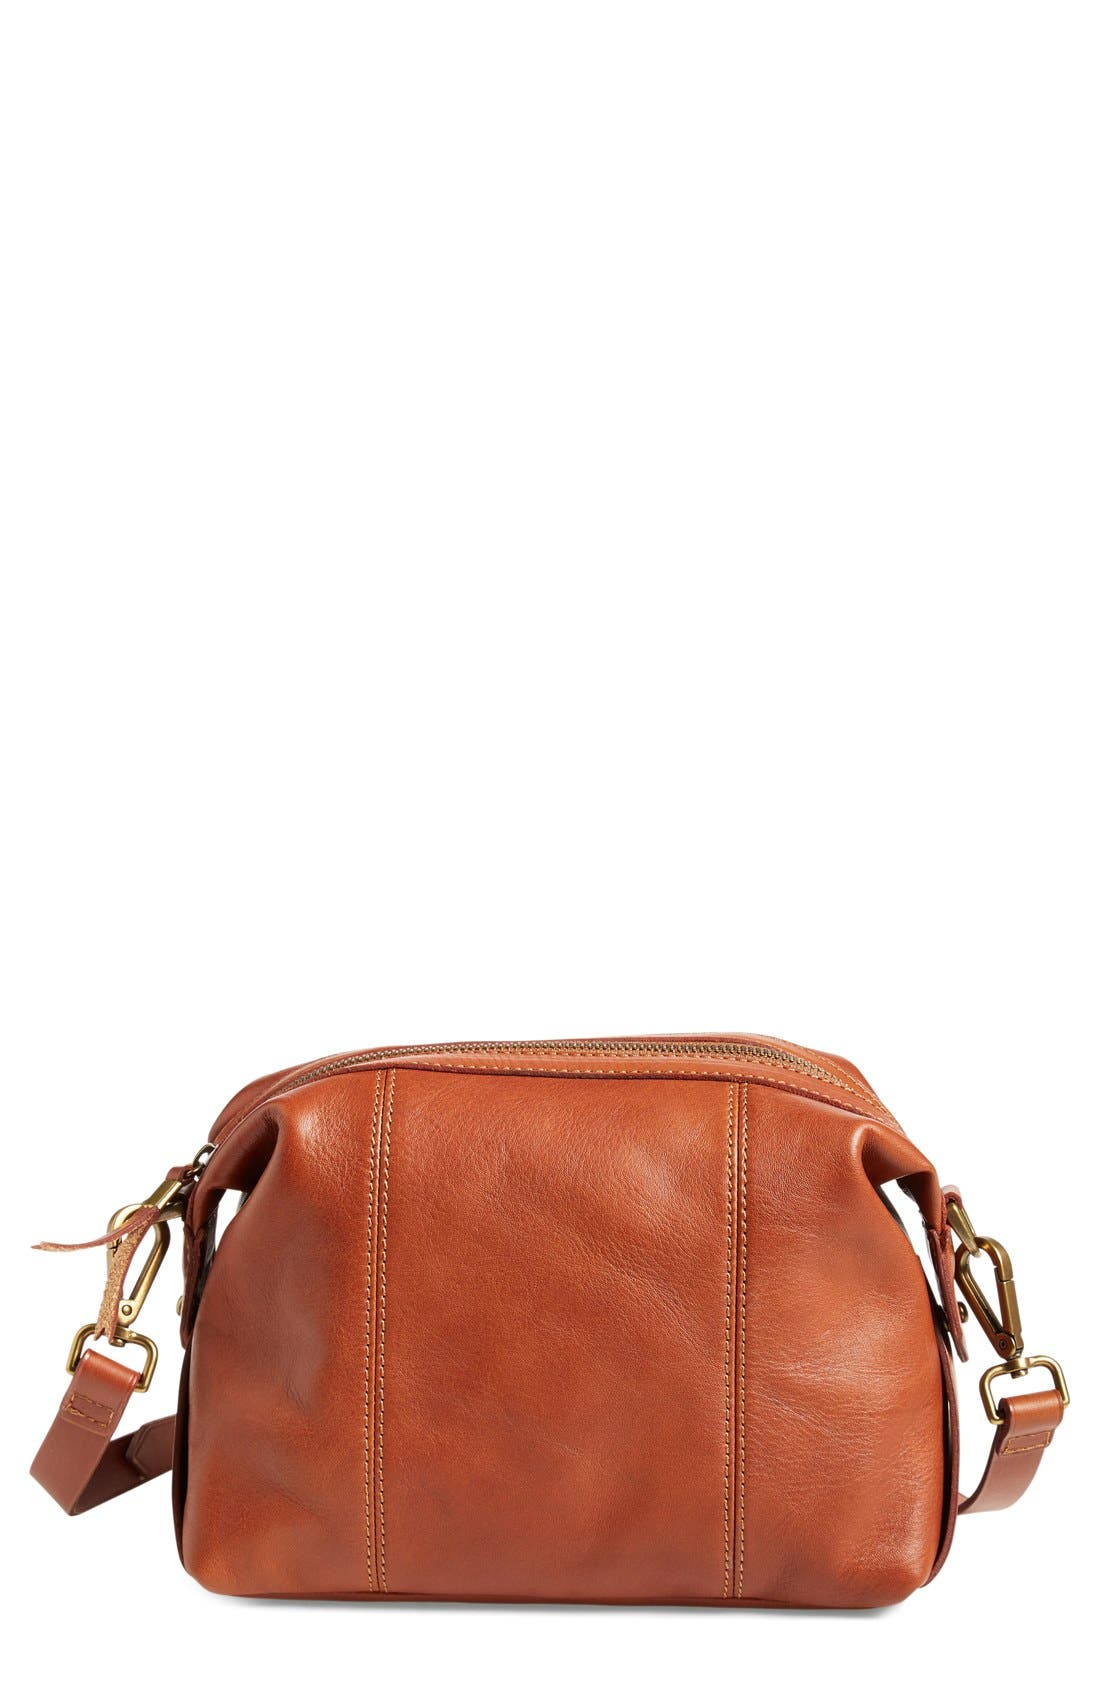 Main Image - Madewell 'Mini Glasgow' Leather Crossbody Bag